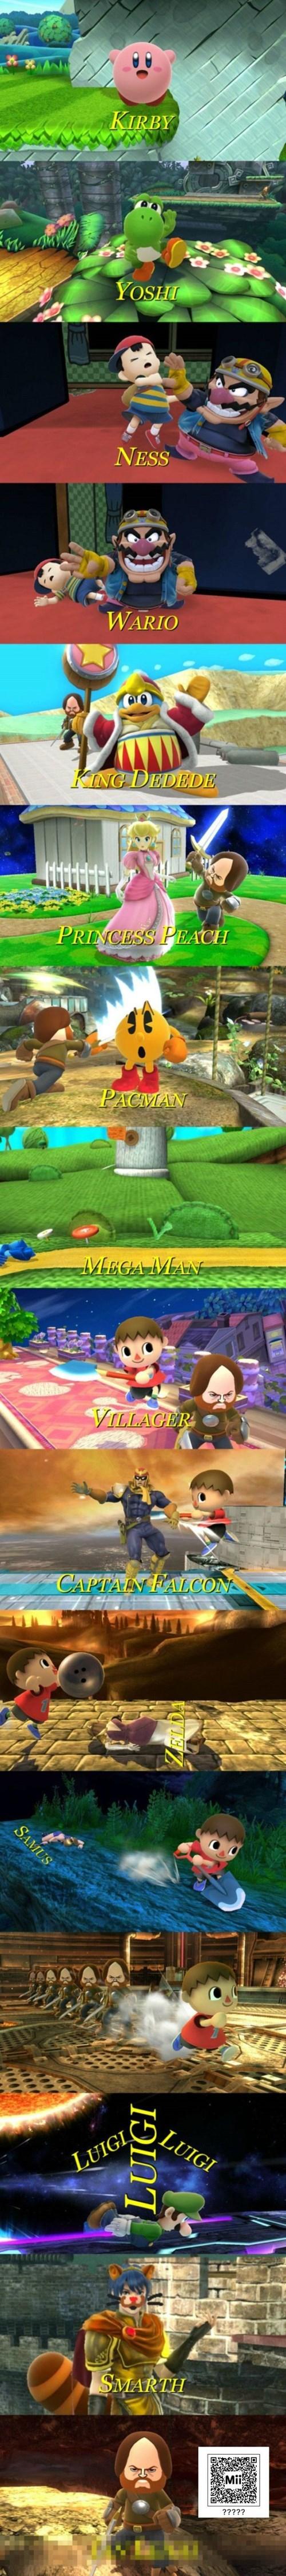 miis super smash bros video games - 8396984832